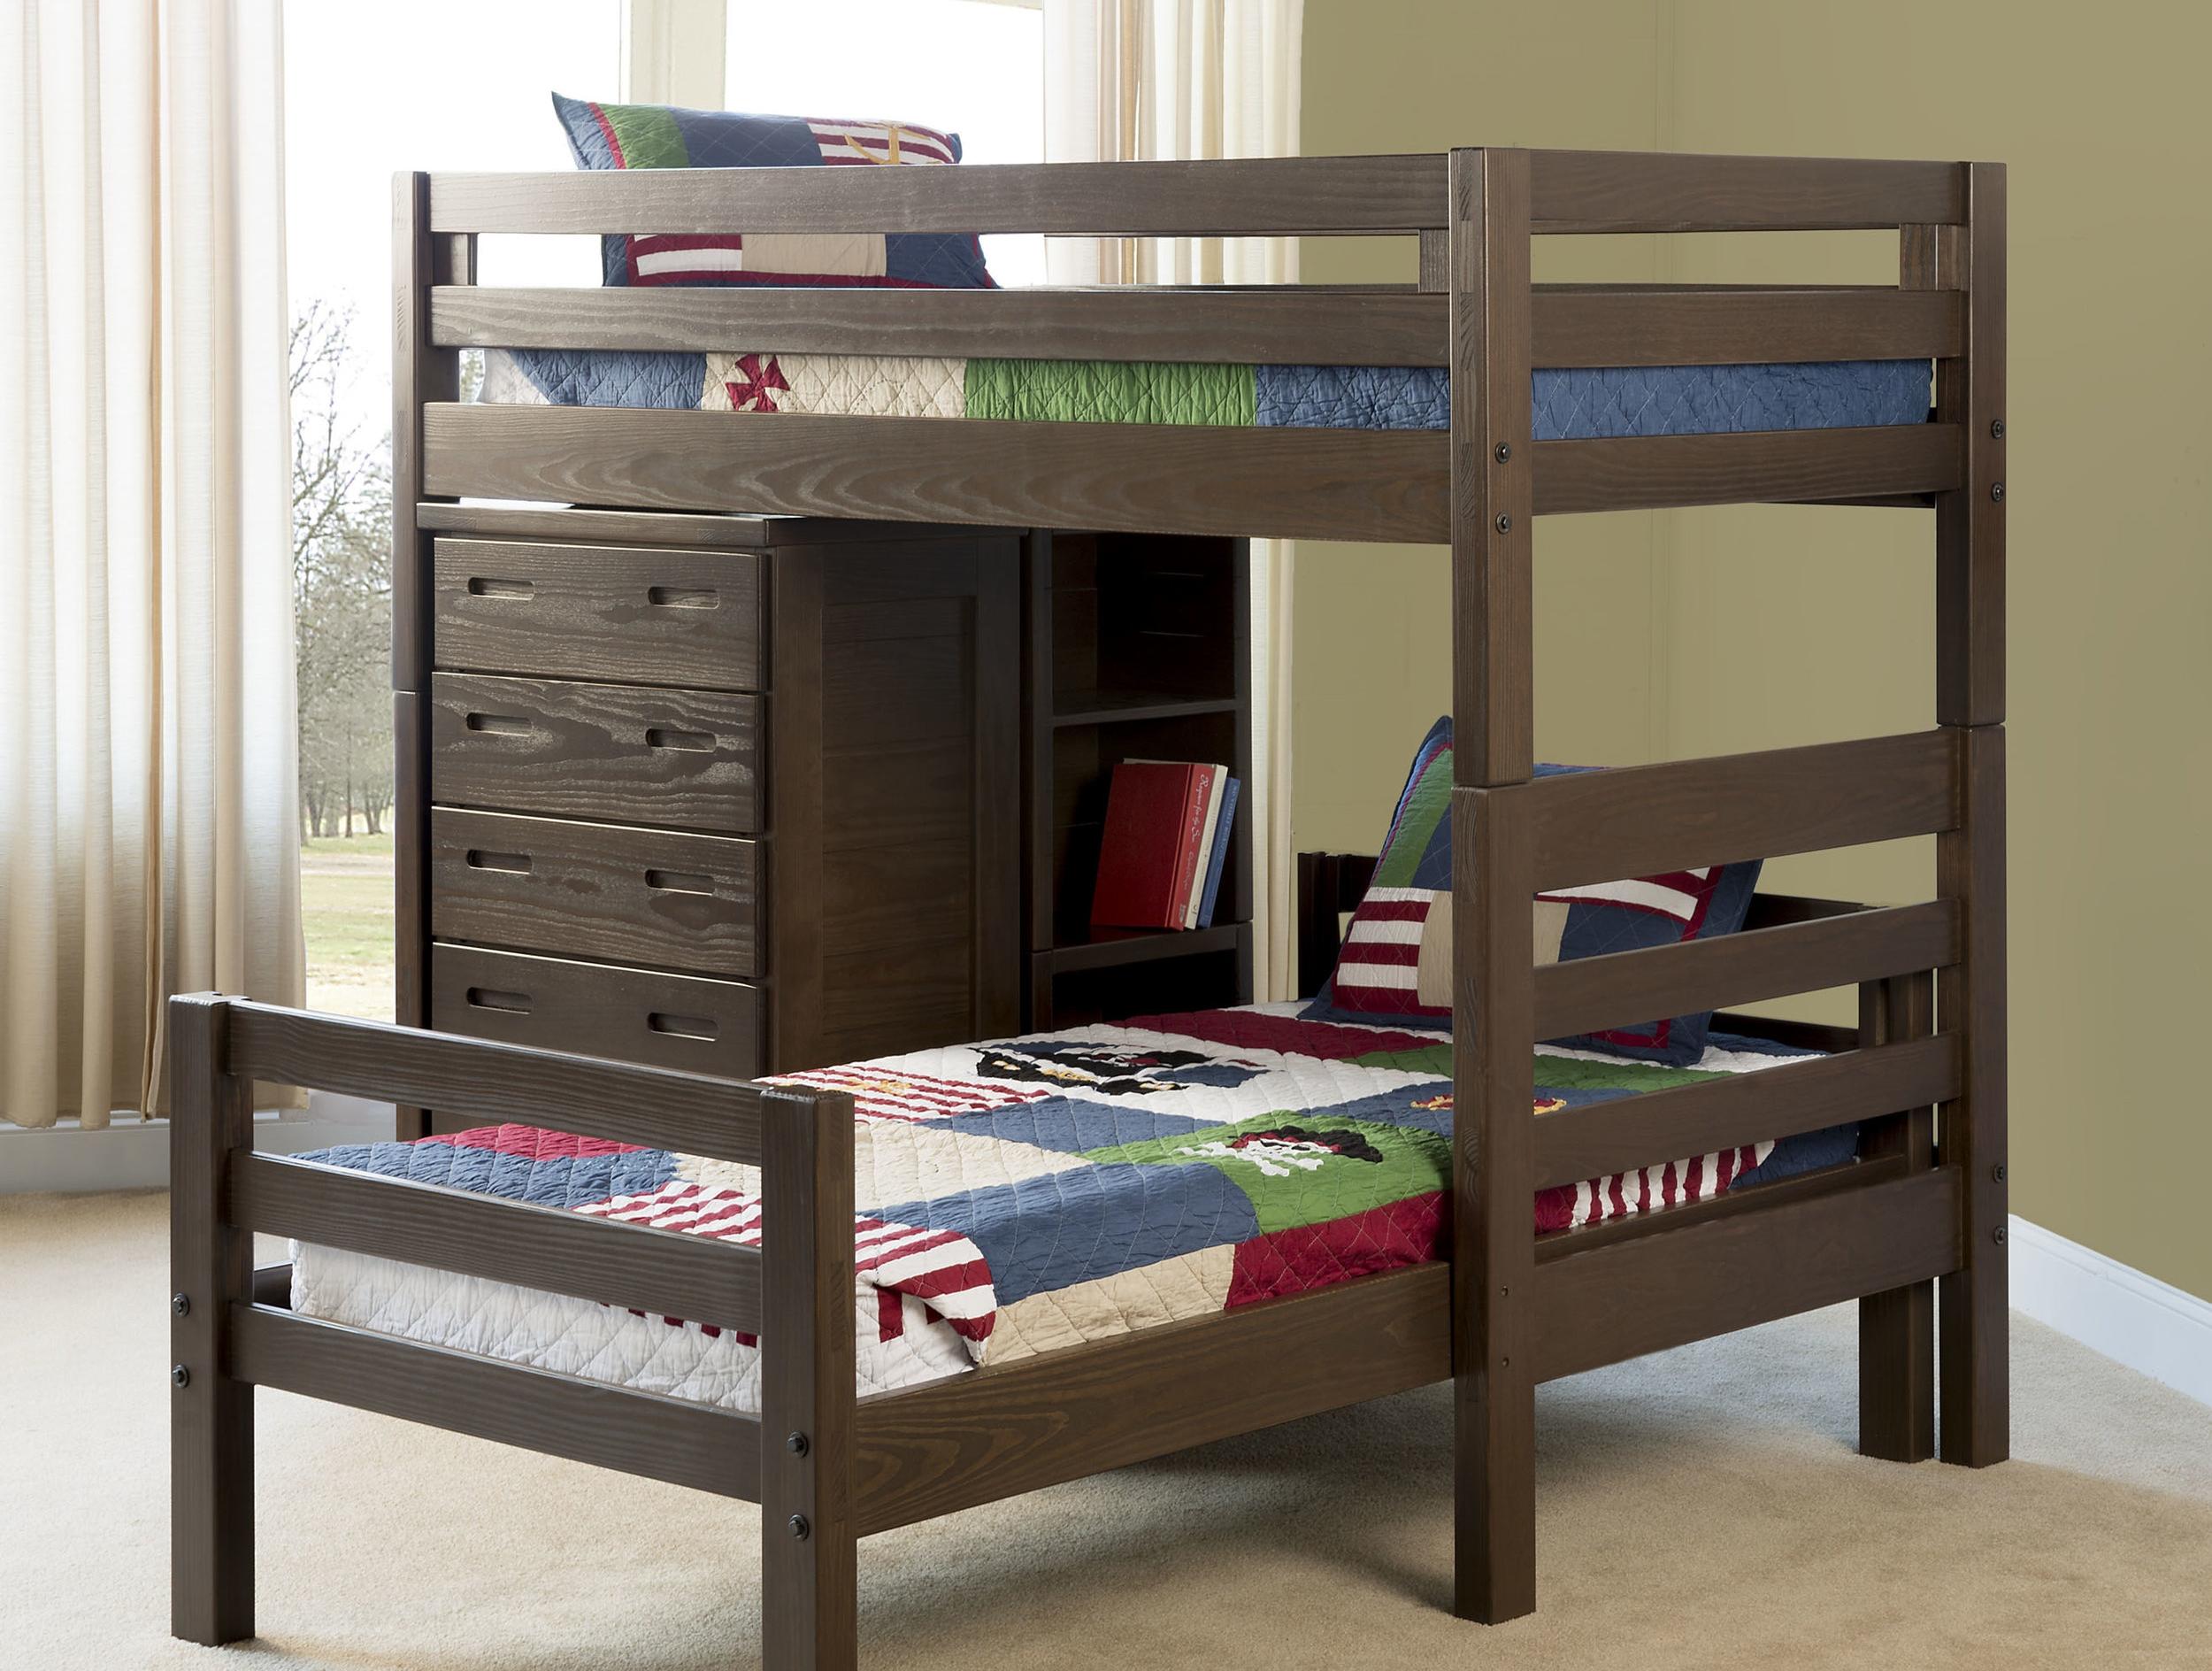 classic bunk beds in espresso